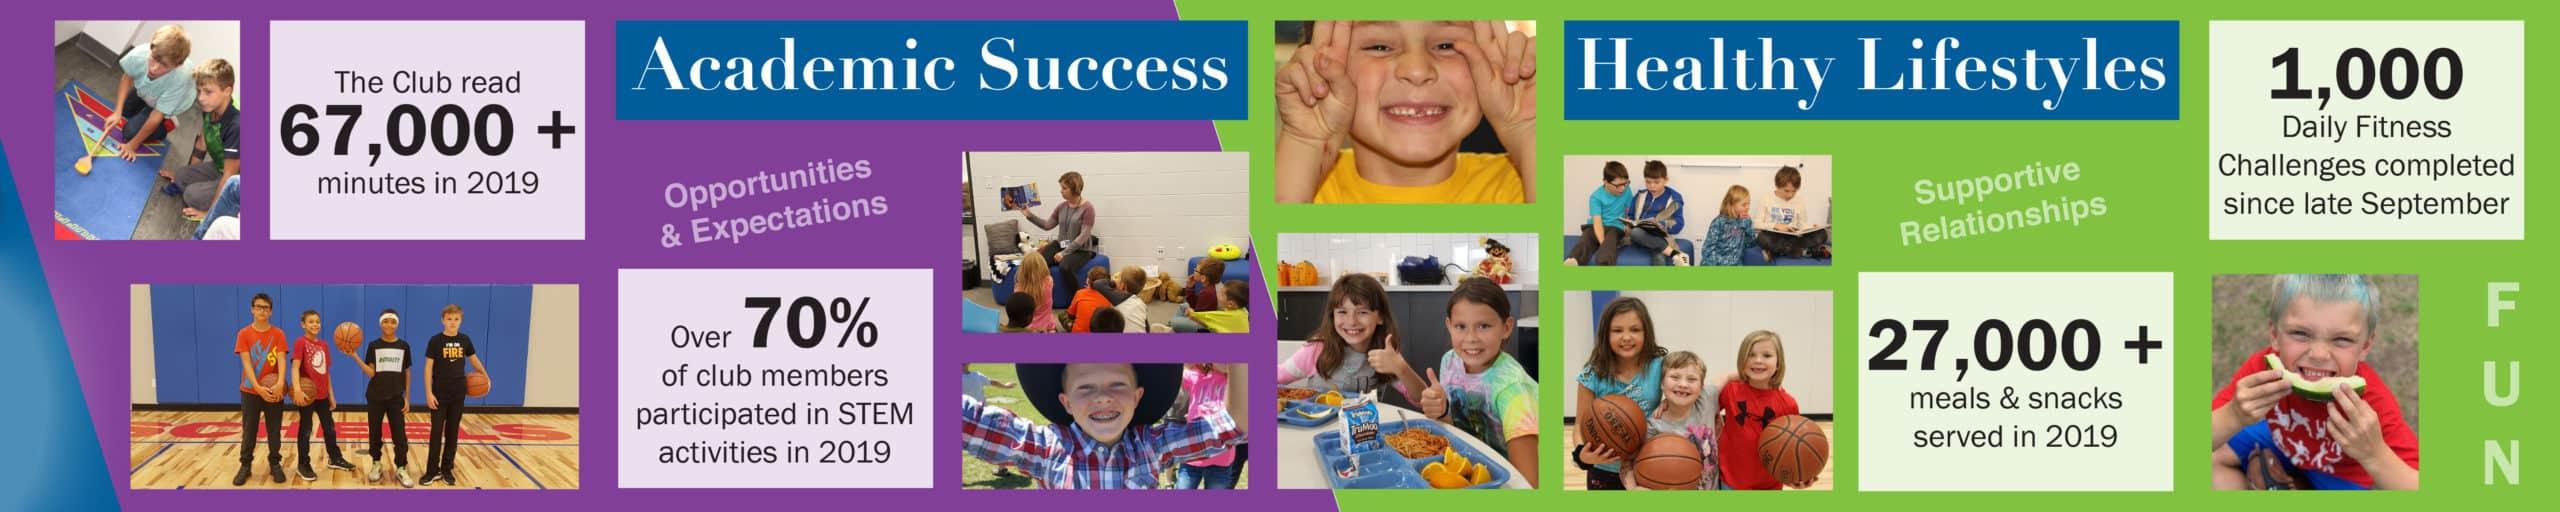 Boys & Girls Club enables academic success